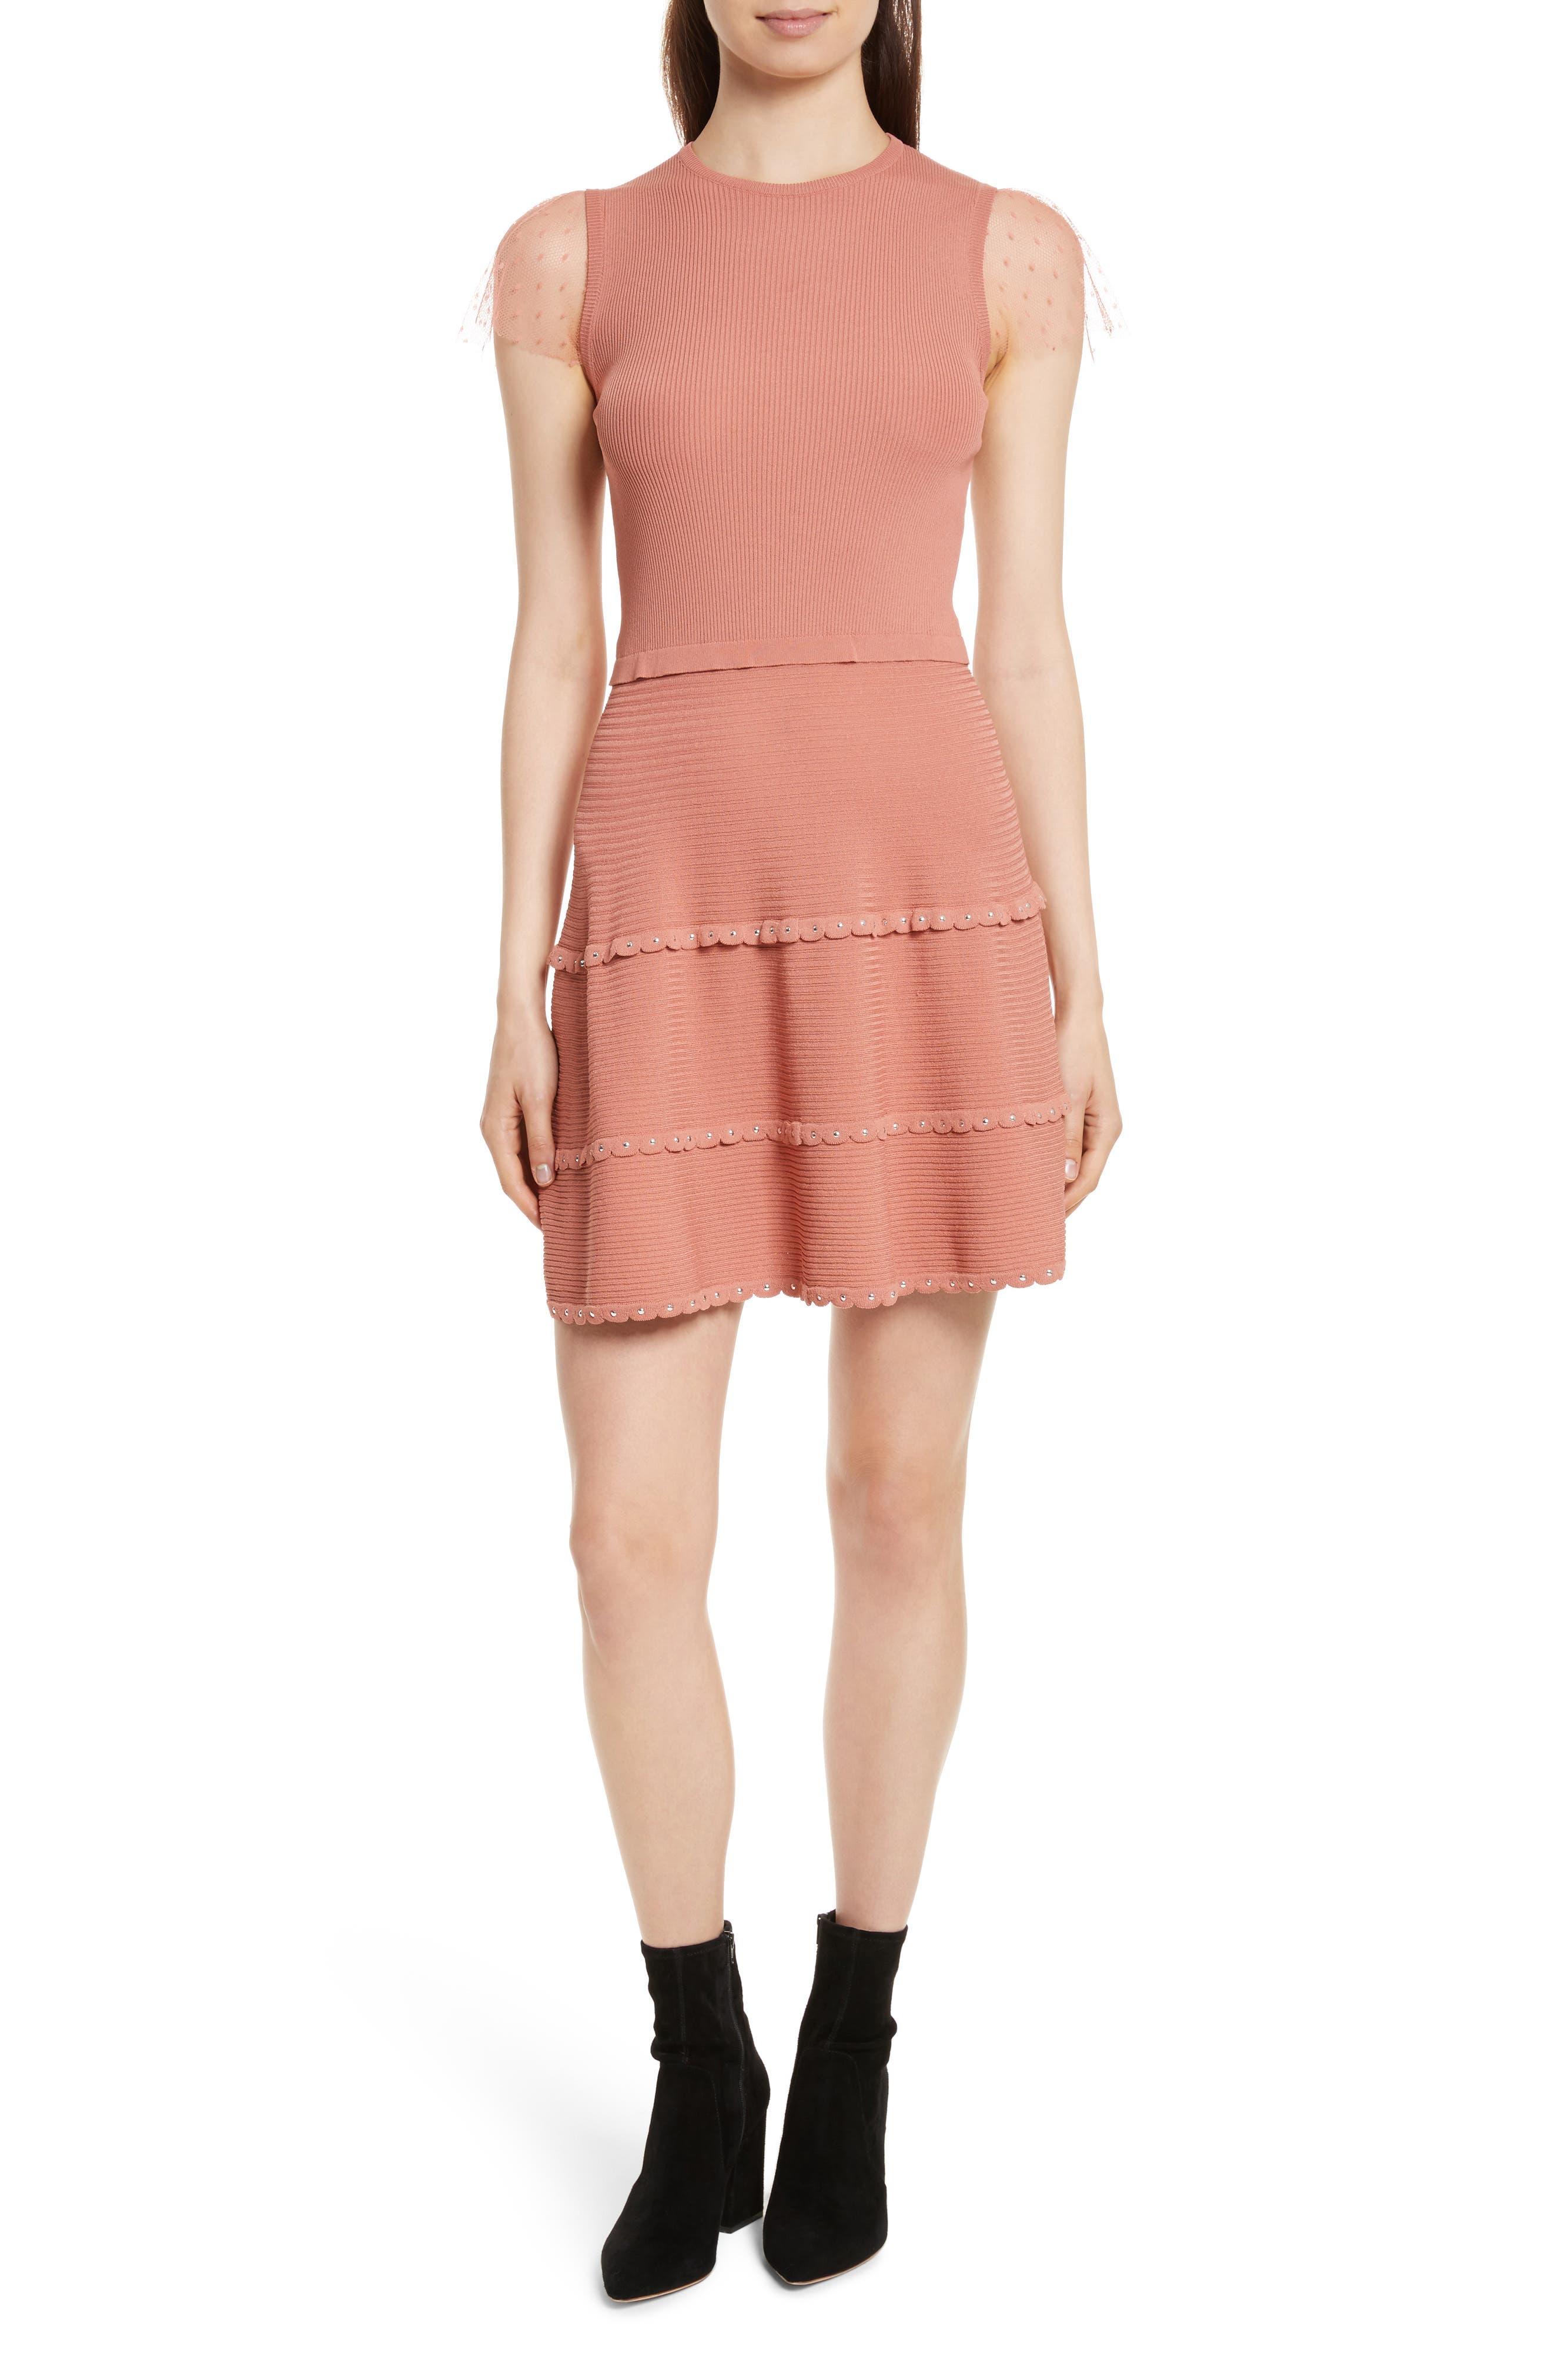 Scallop Stretch Knit Dress,                         Main,                         color, Antique Rose Light